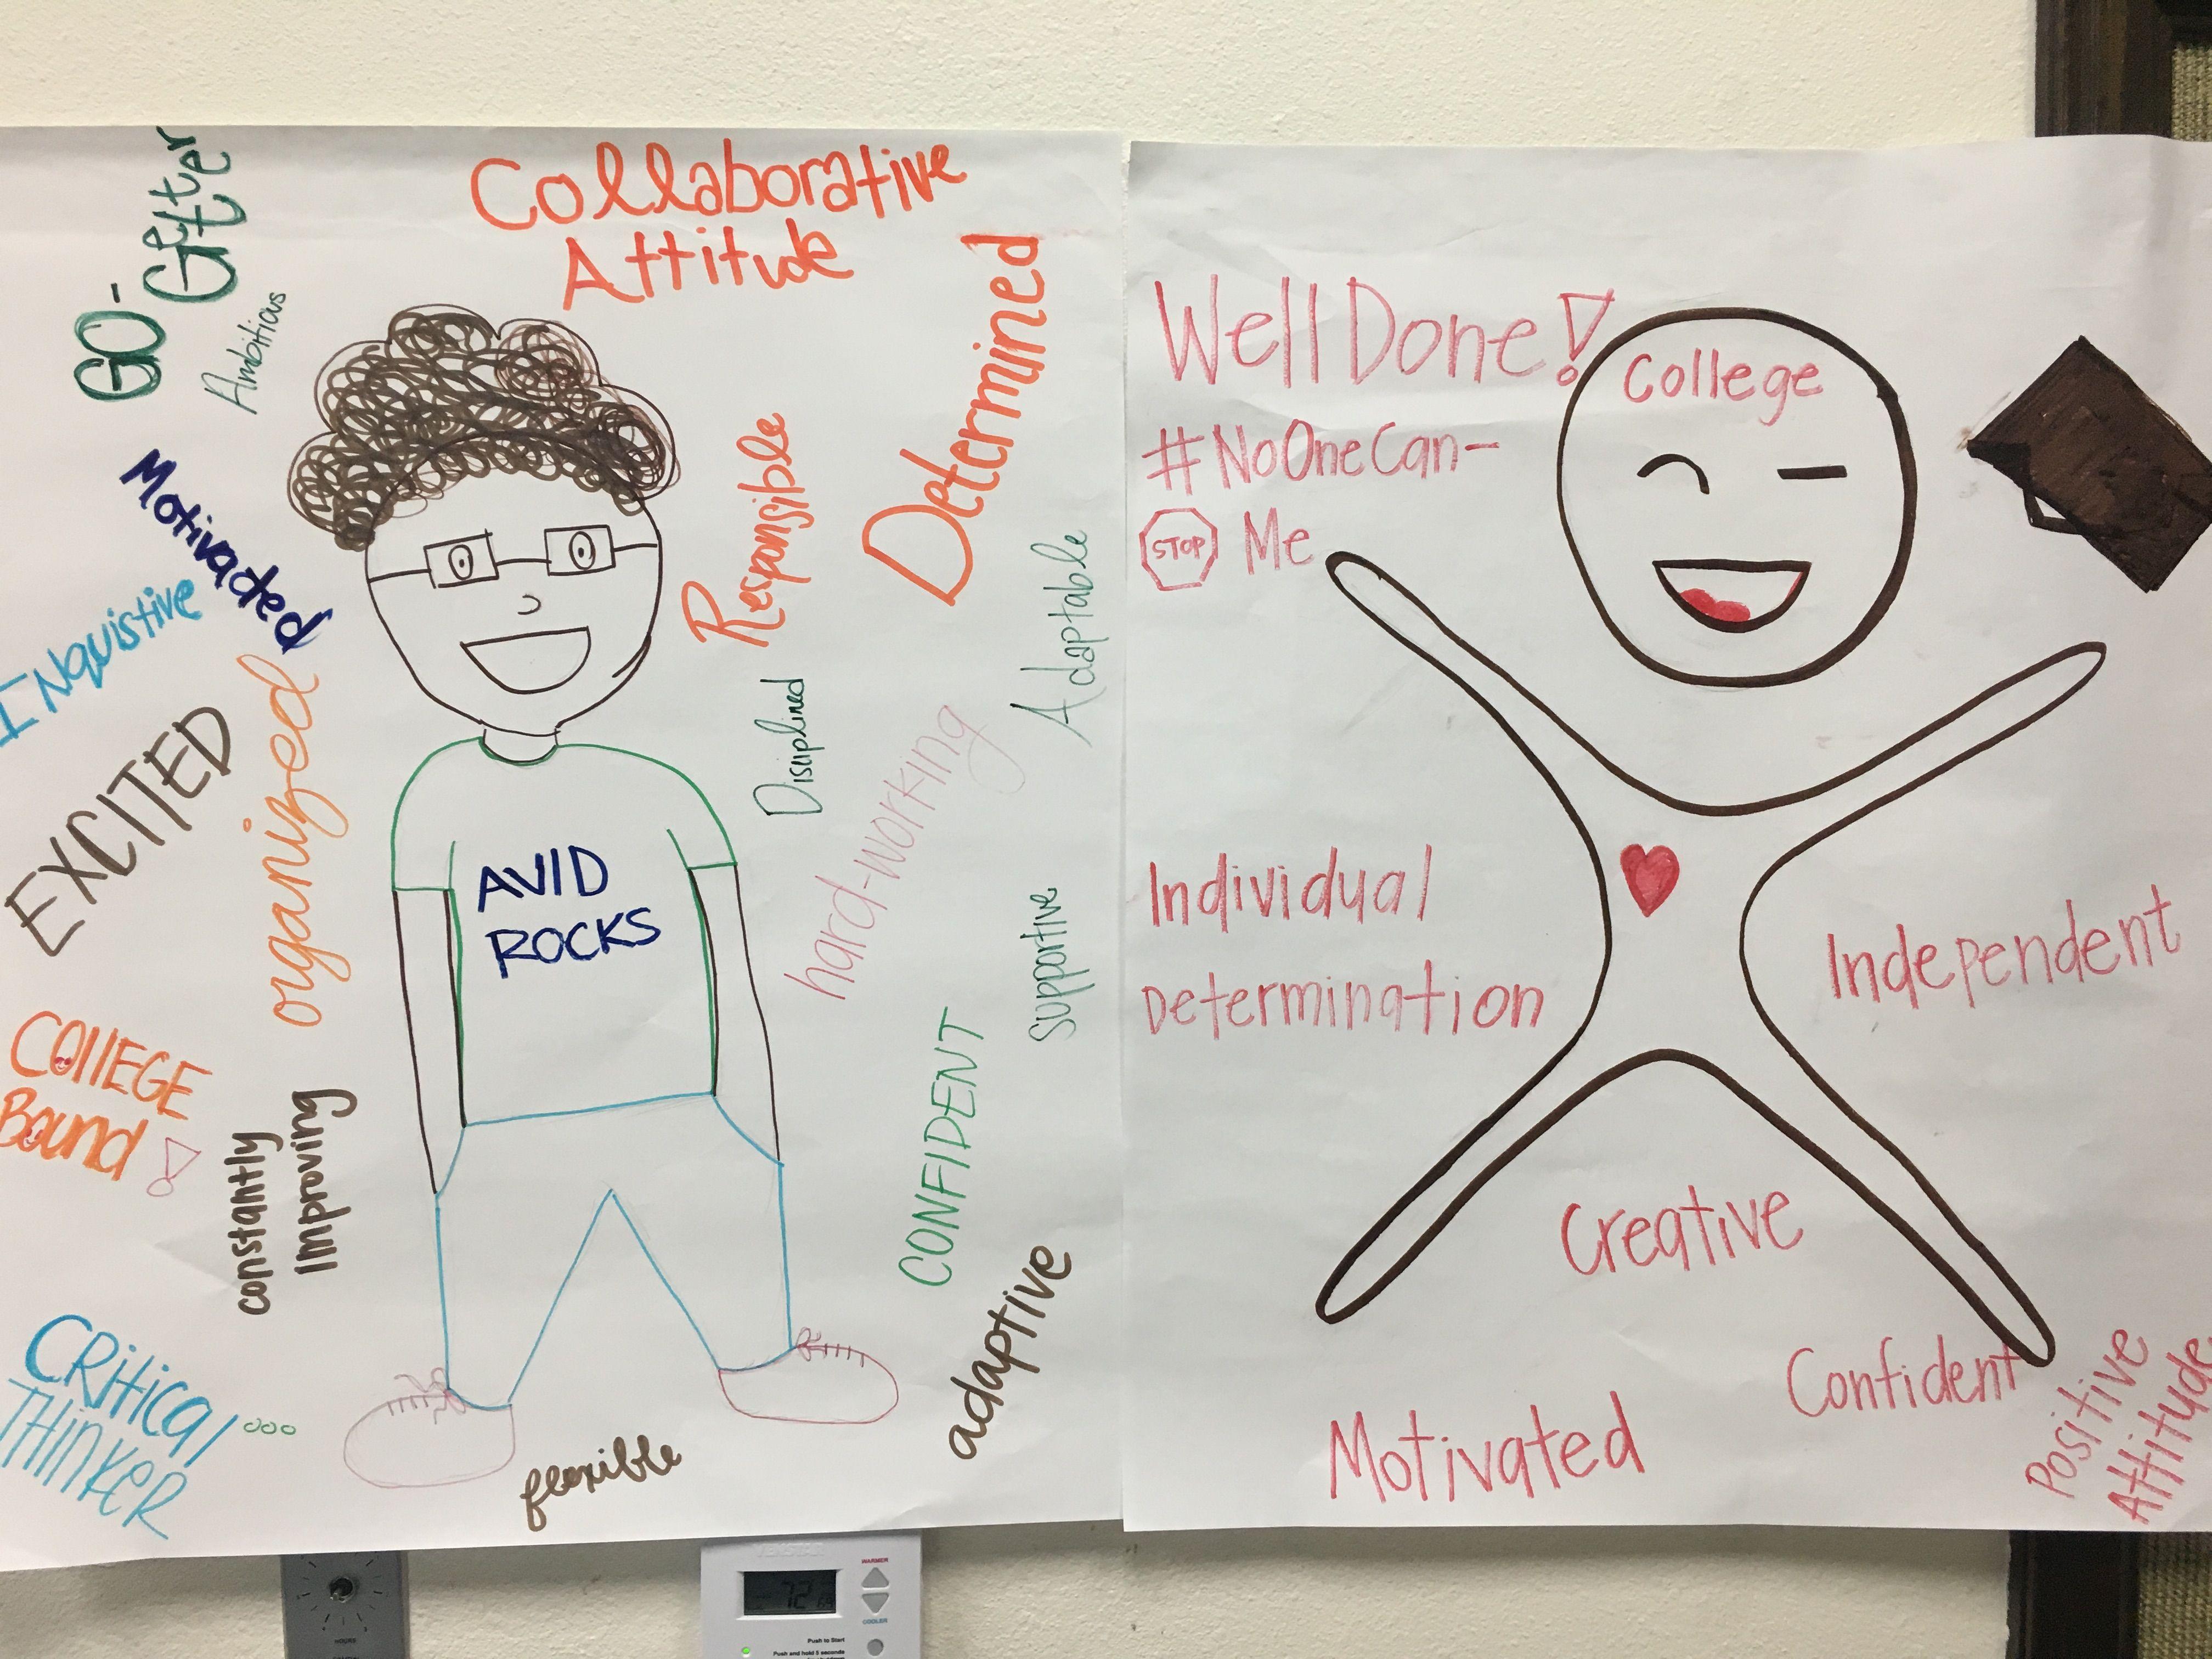 Pin By Terri Verhaegen On Sausd Avid Classroom Ideas